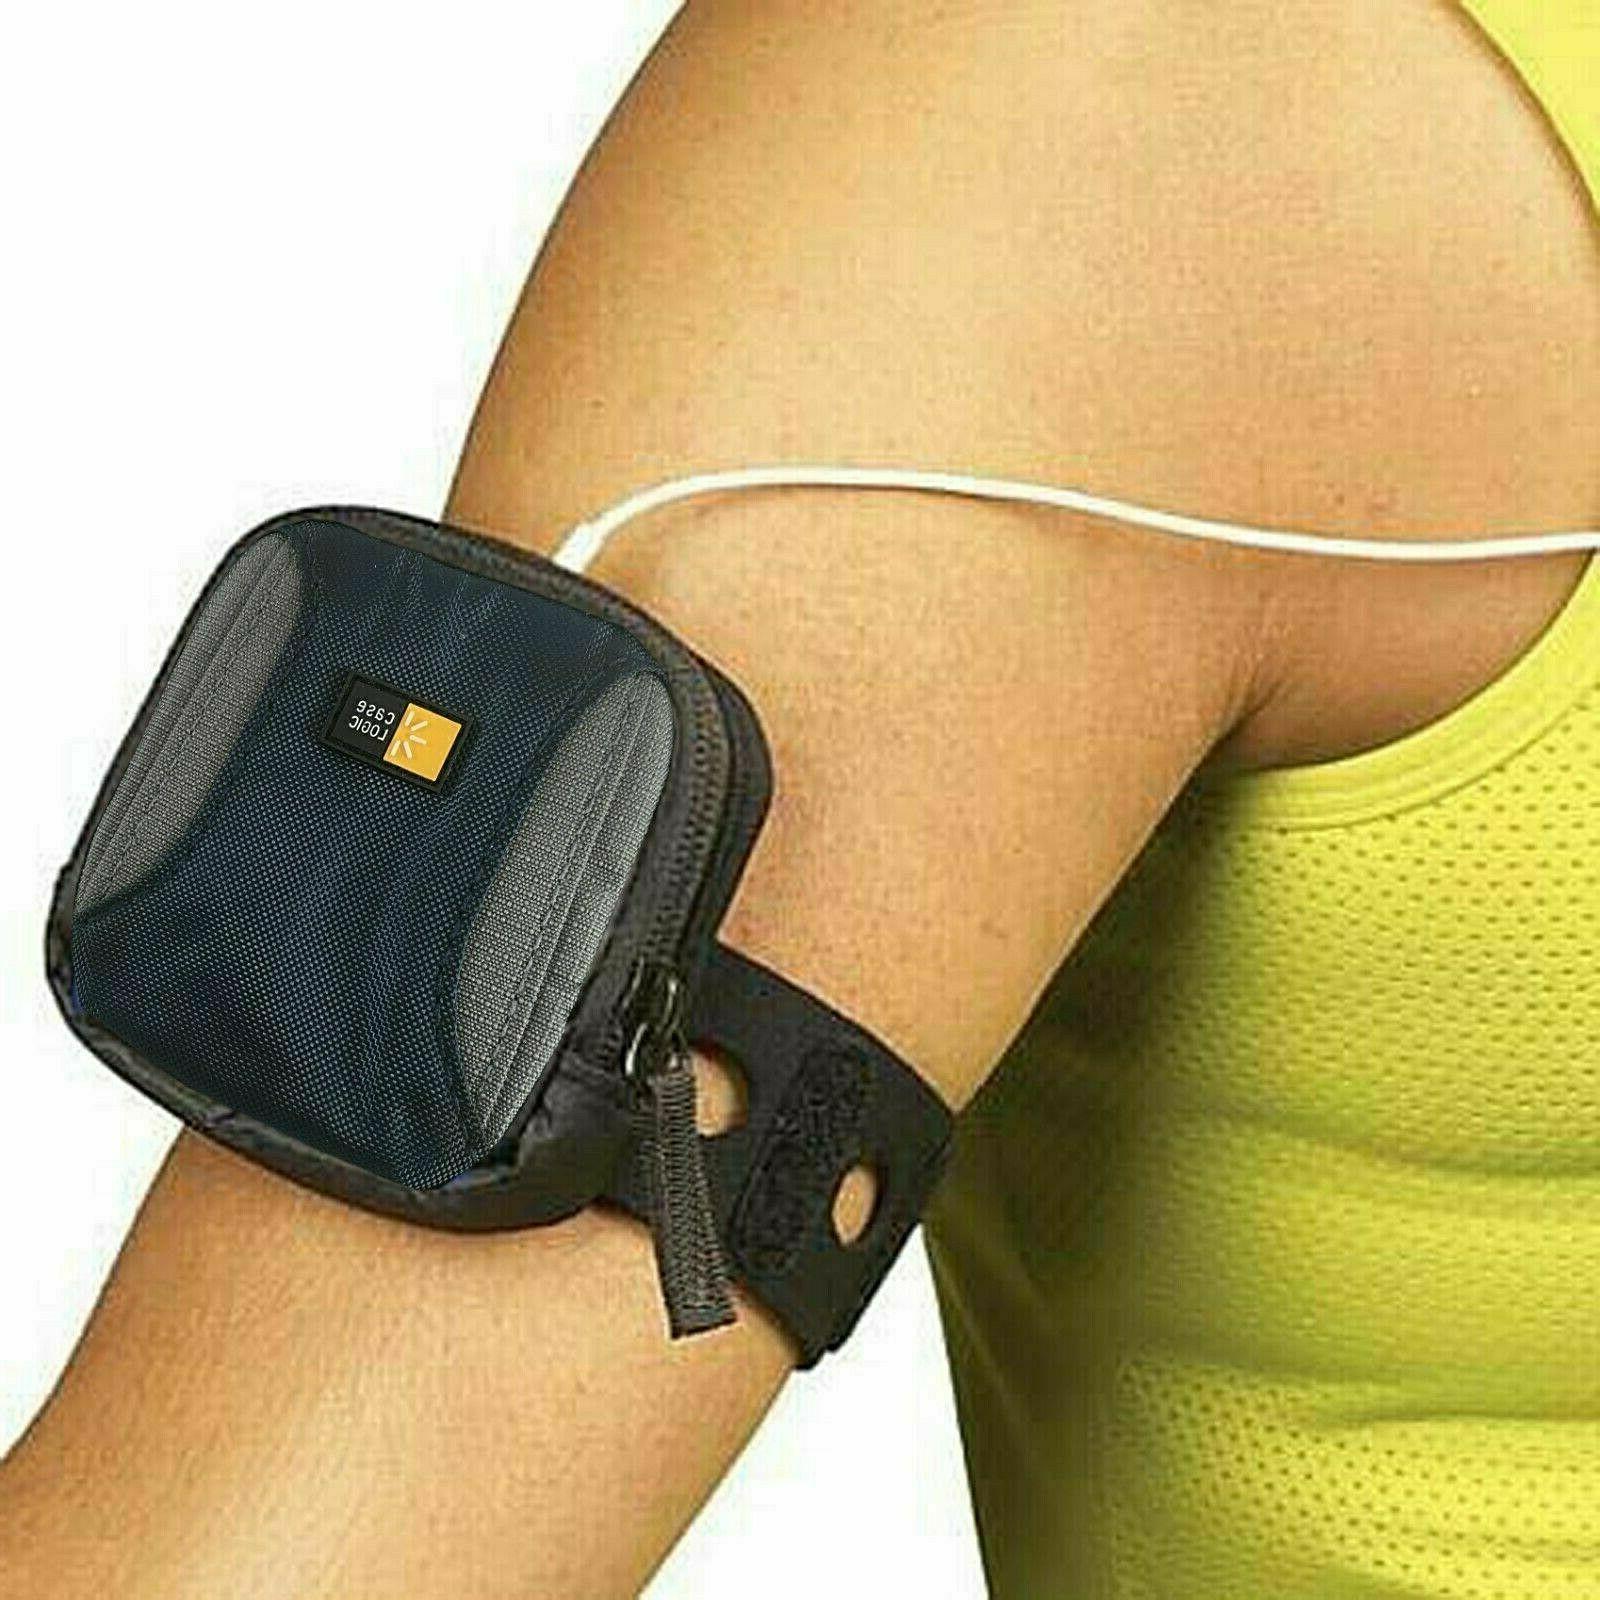 Logic MP3 Player Small Phone Case Fitness Gym Running Walkin